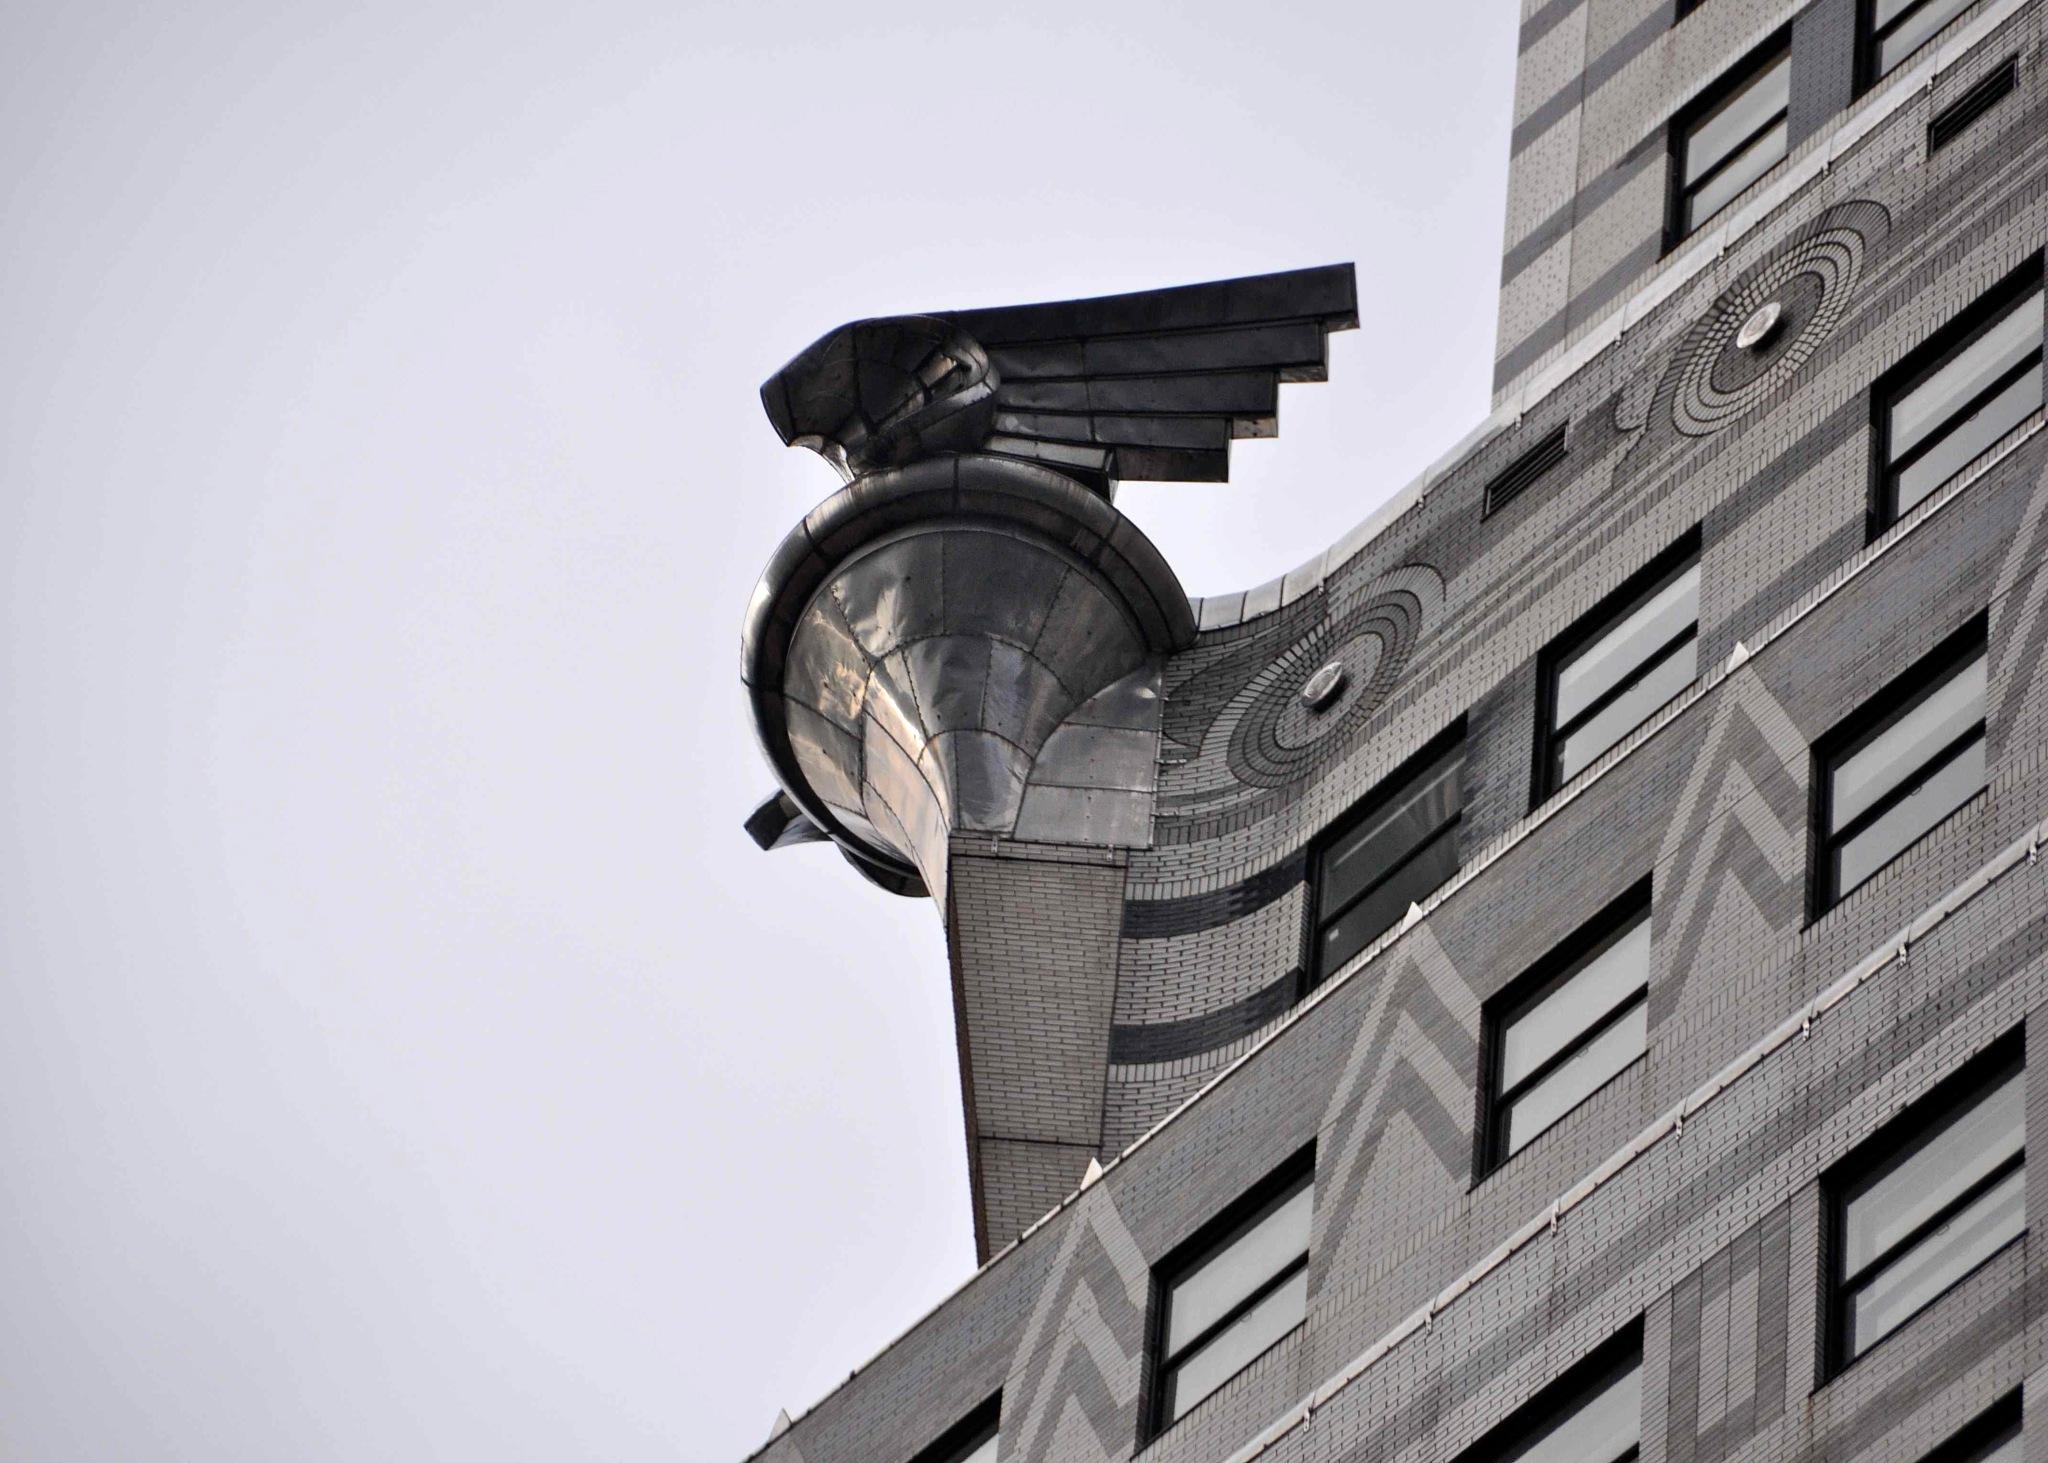 Chrysler Building (detail) by kfboland125